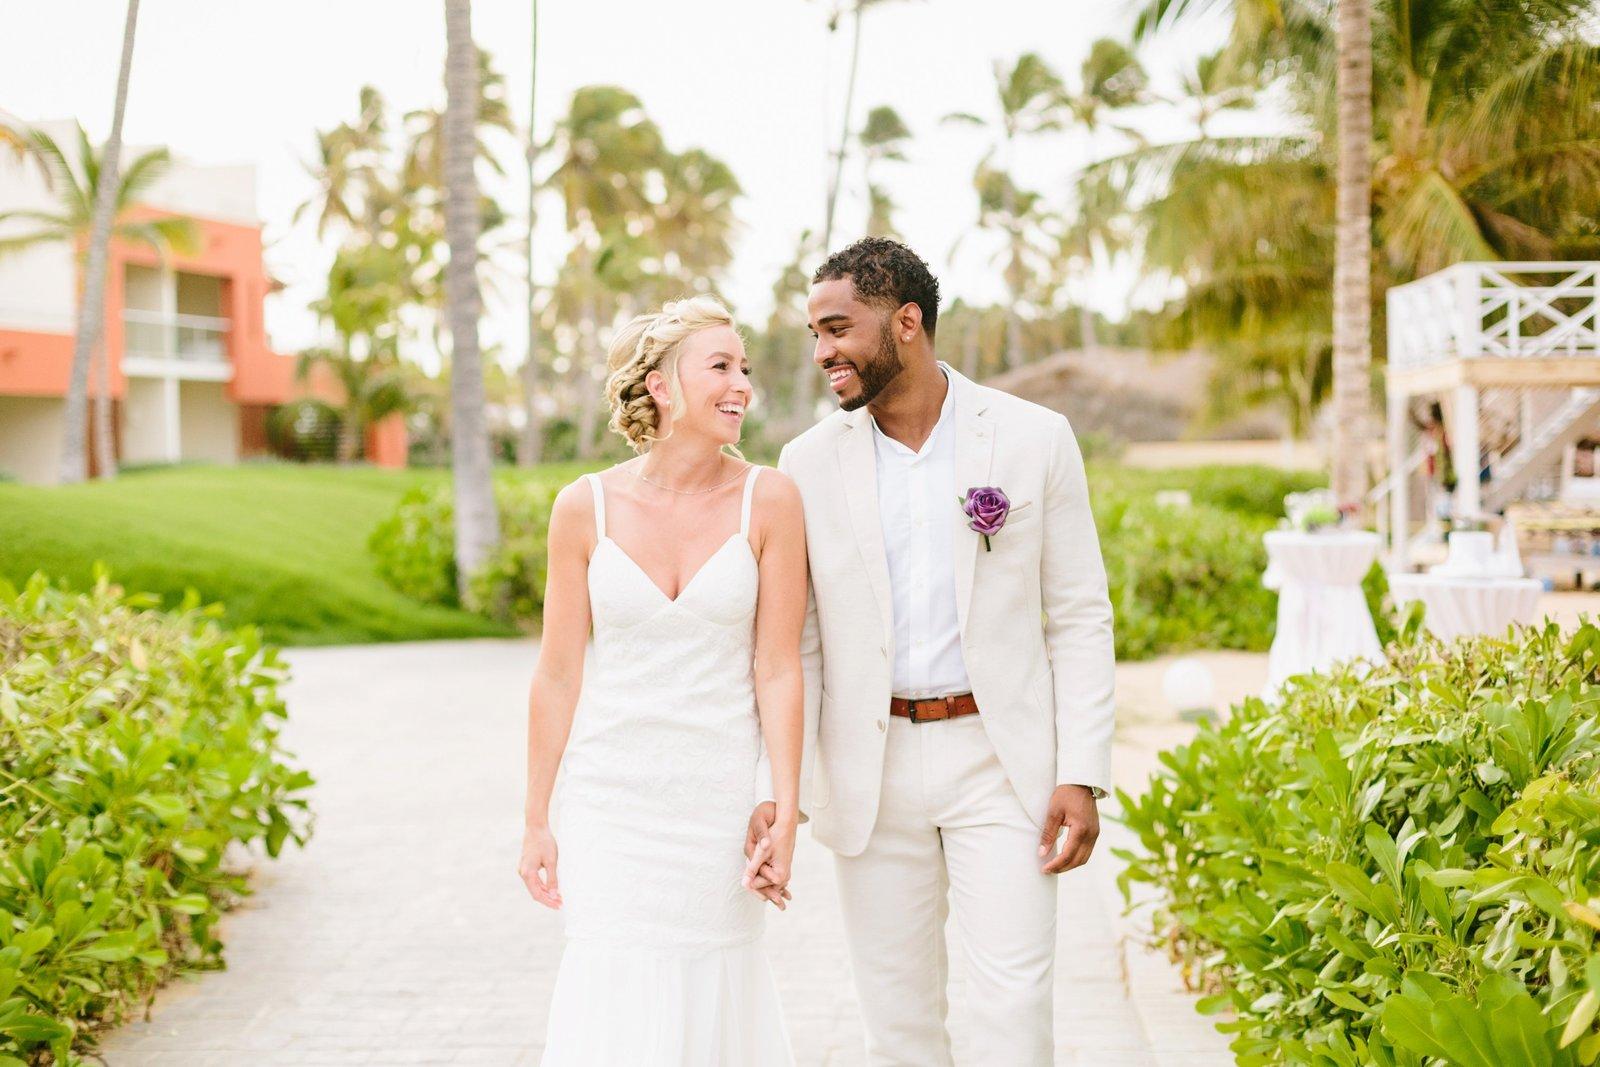 Wedding Photos-Jodee Debes Photography-157